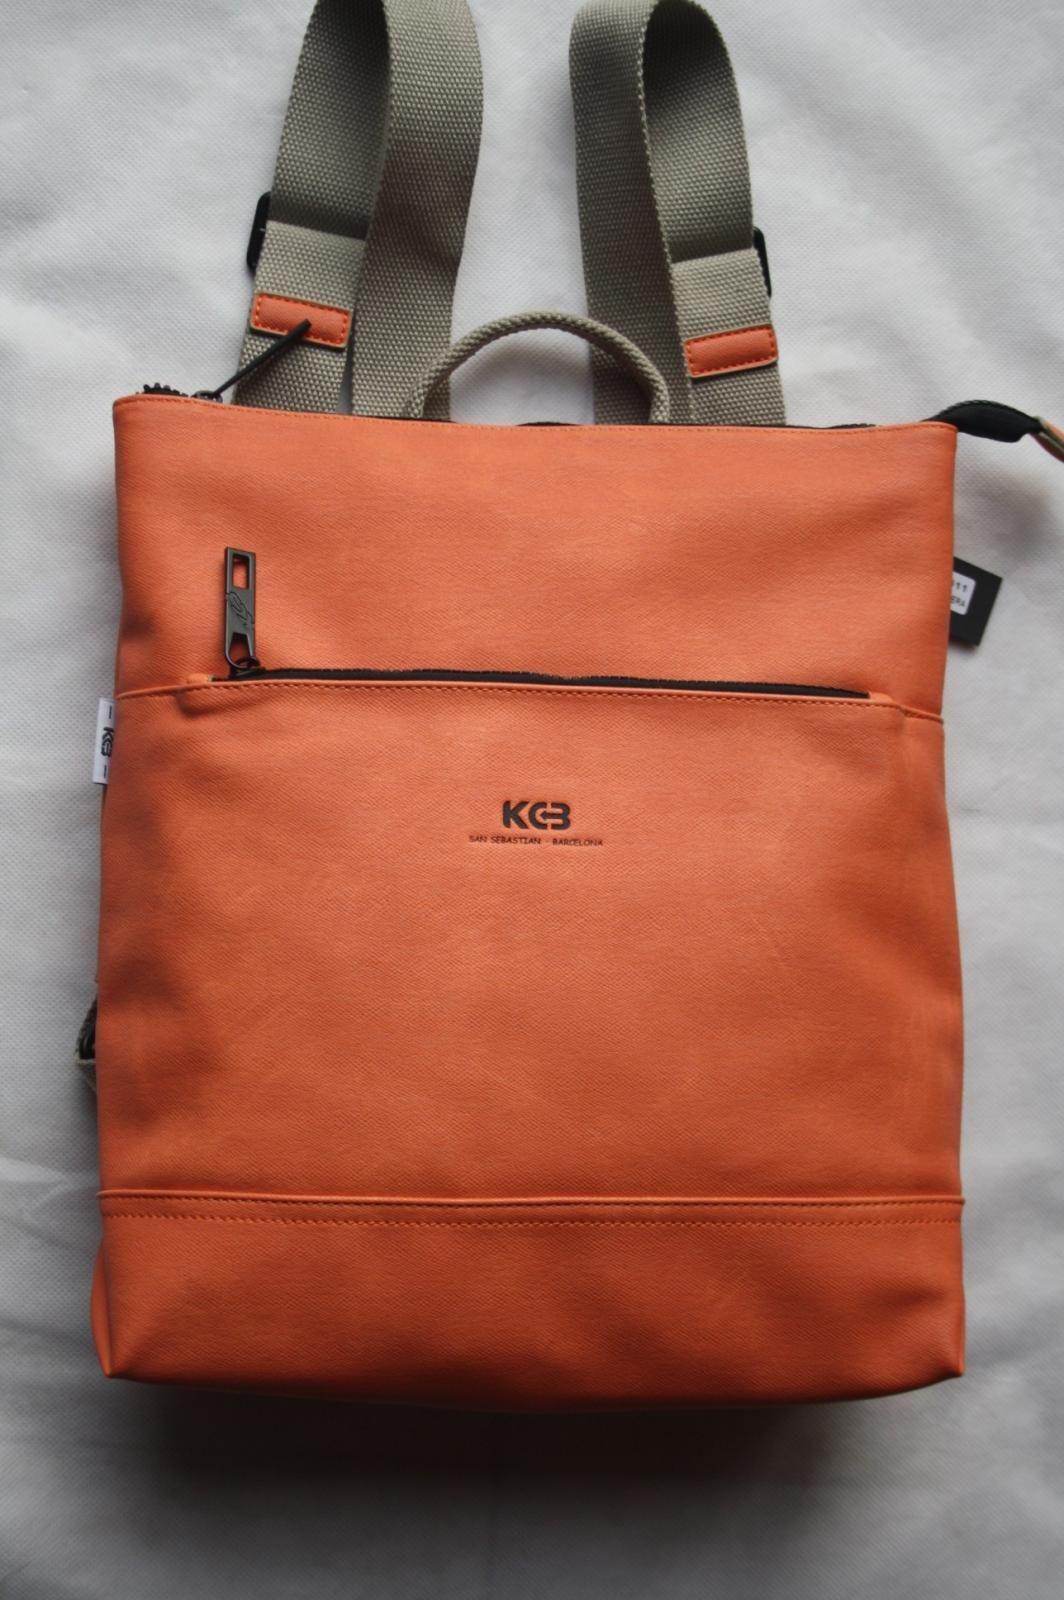 53ee11f64 Bolso & mochila KCB 71611 Naranja 46.00€ | KCB 2017 | Bags